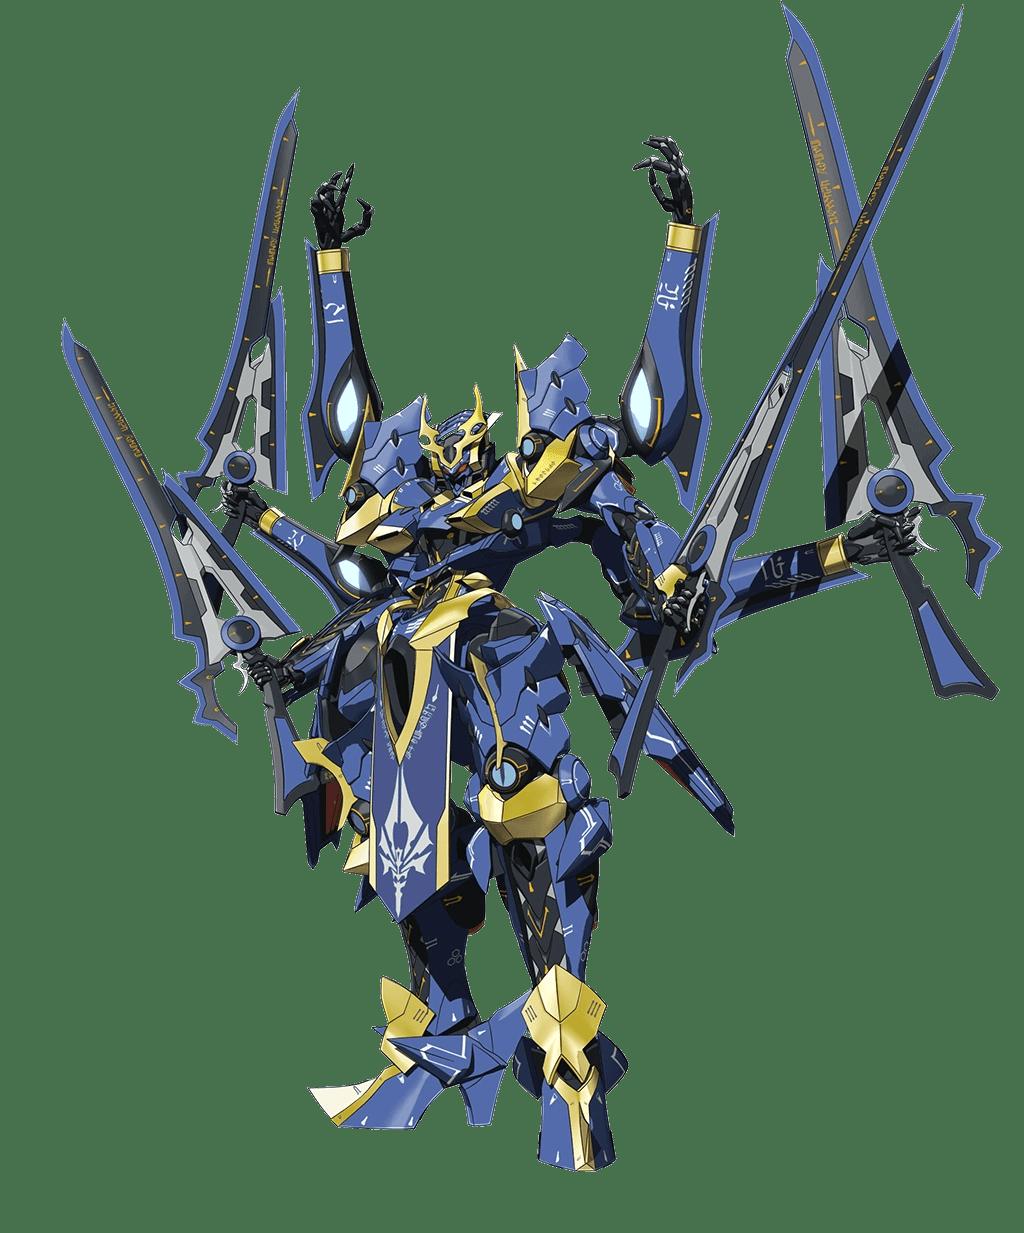 ikaruga anime knight s